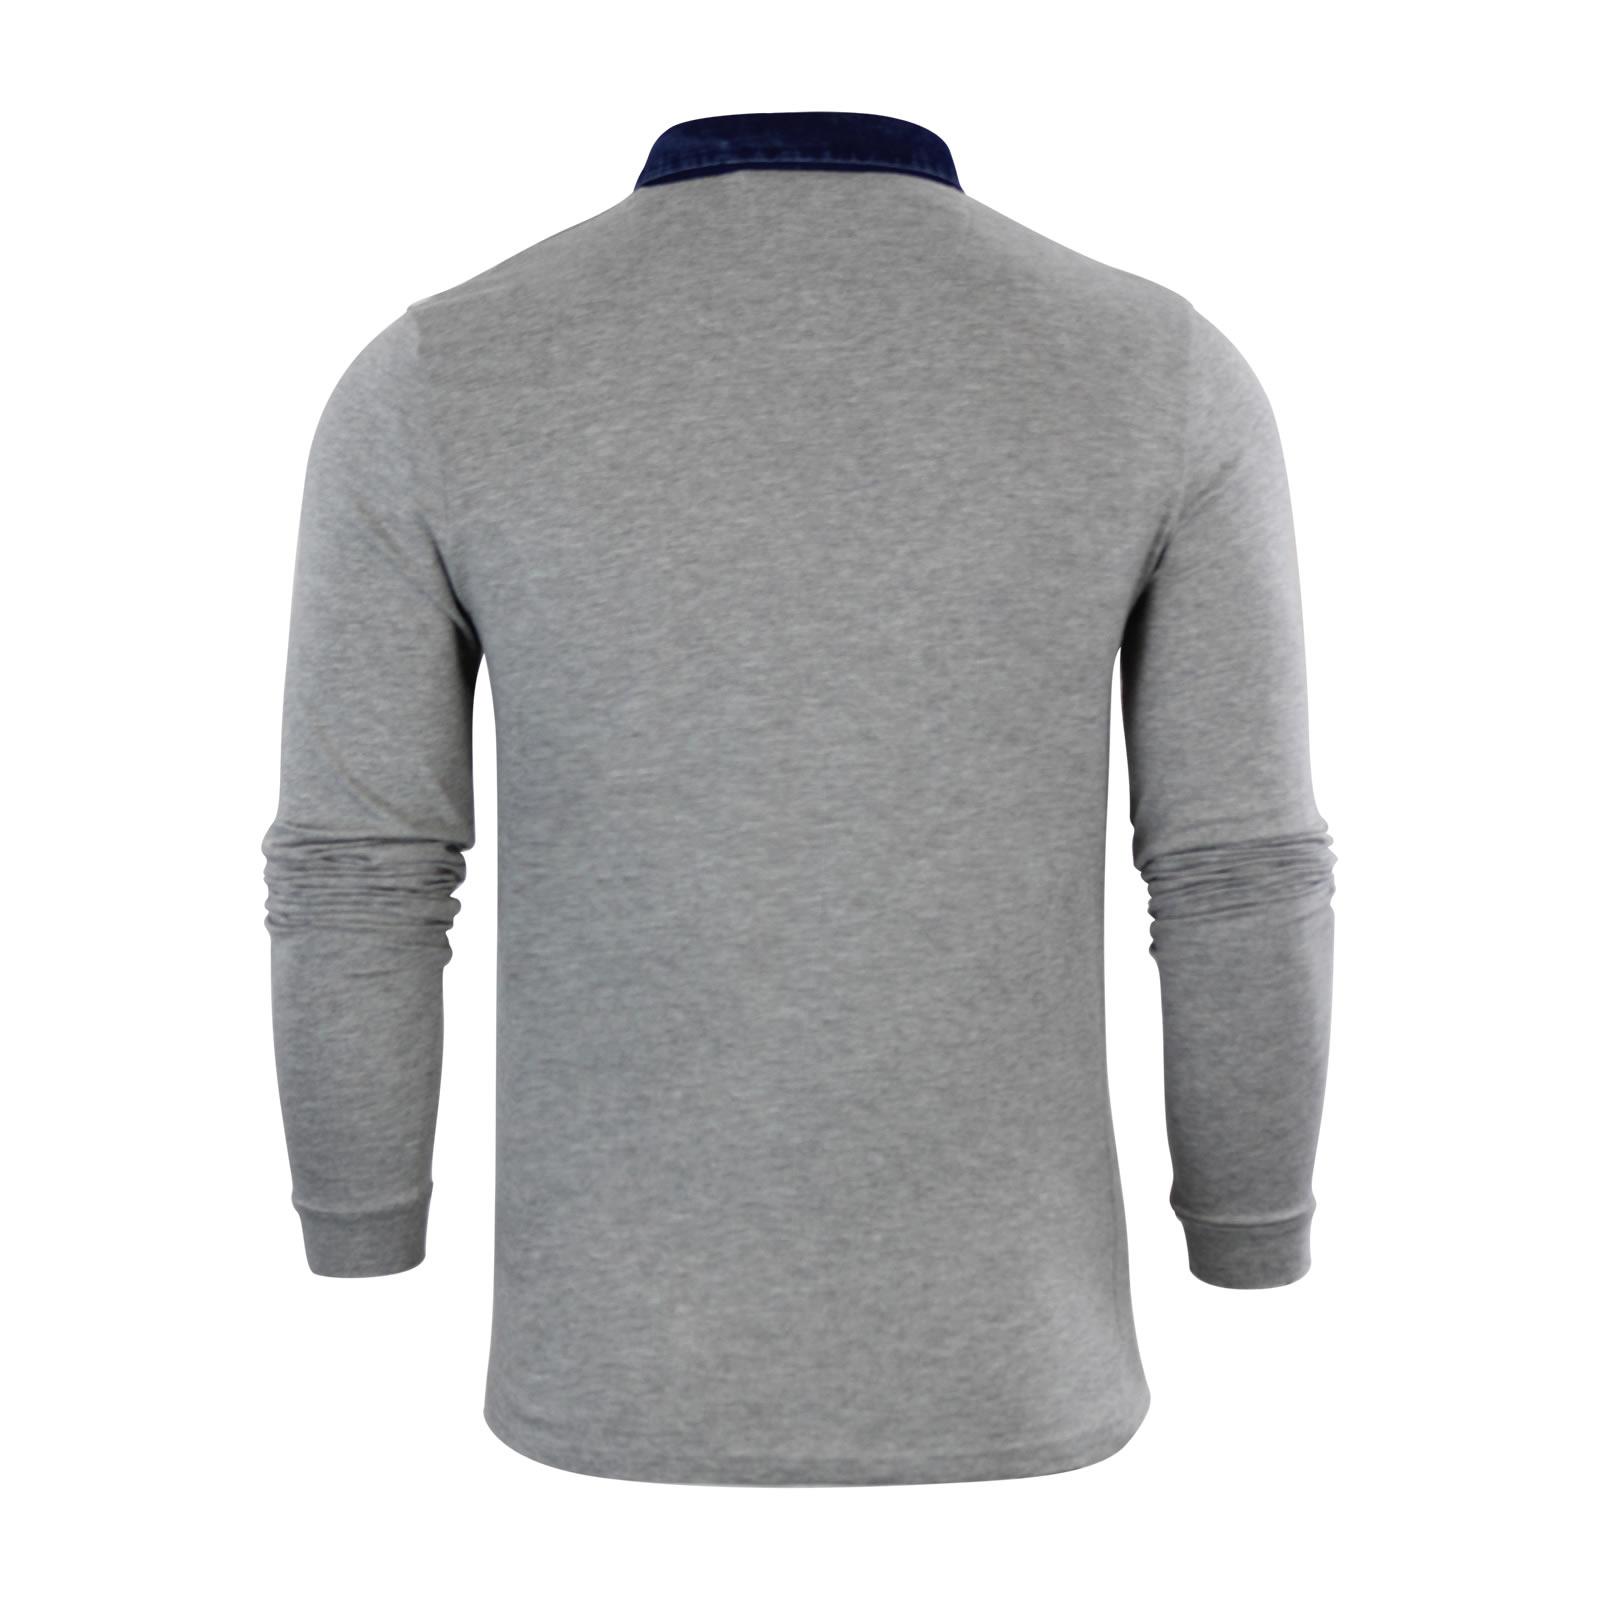 Mens-Polo-T-Shirt-Brave-Soul-Gospel-Denim-Collared-Long-Sleeve-Casual-Top thumbnail 3